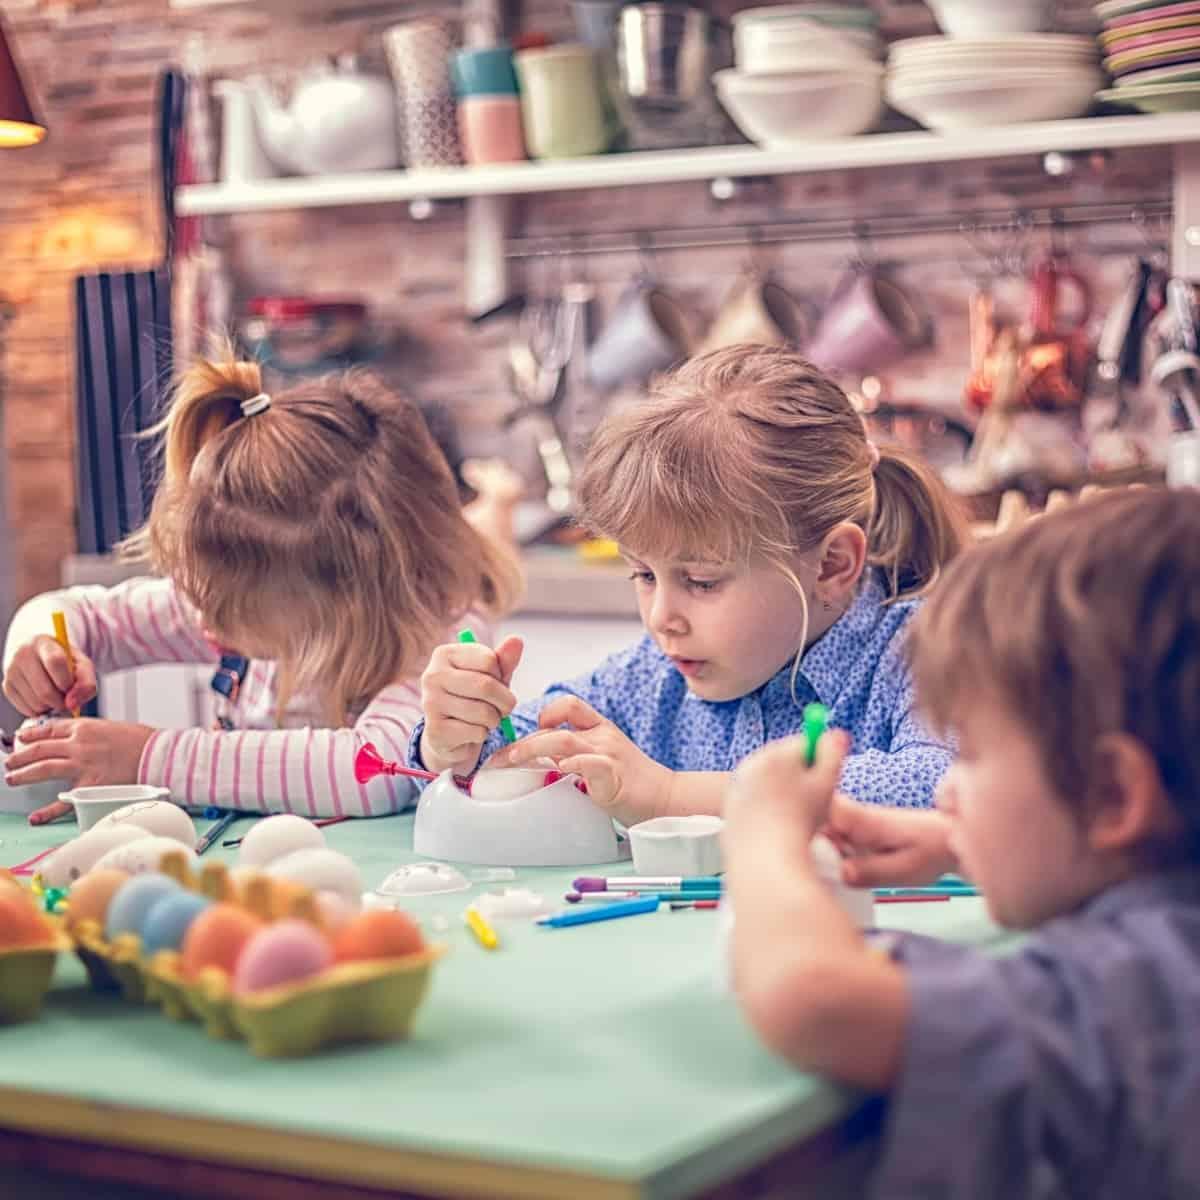 kids making art and crafts